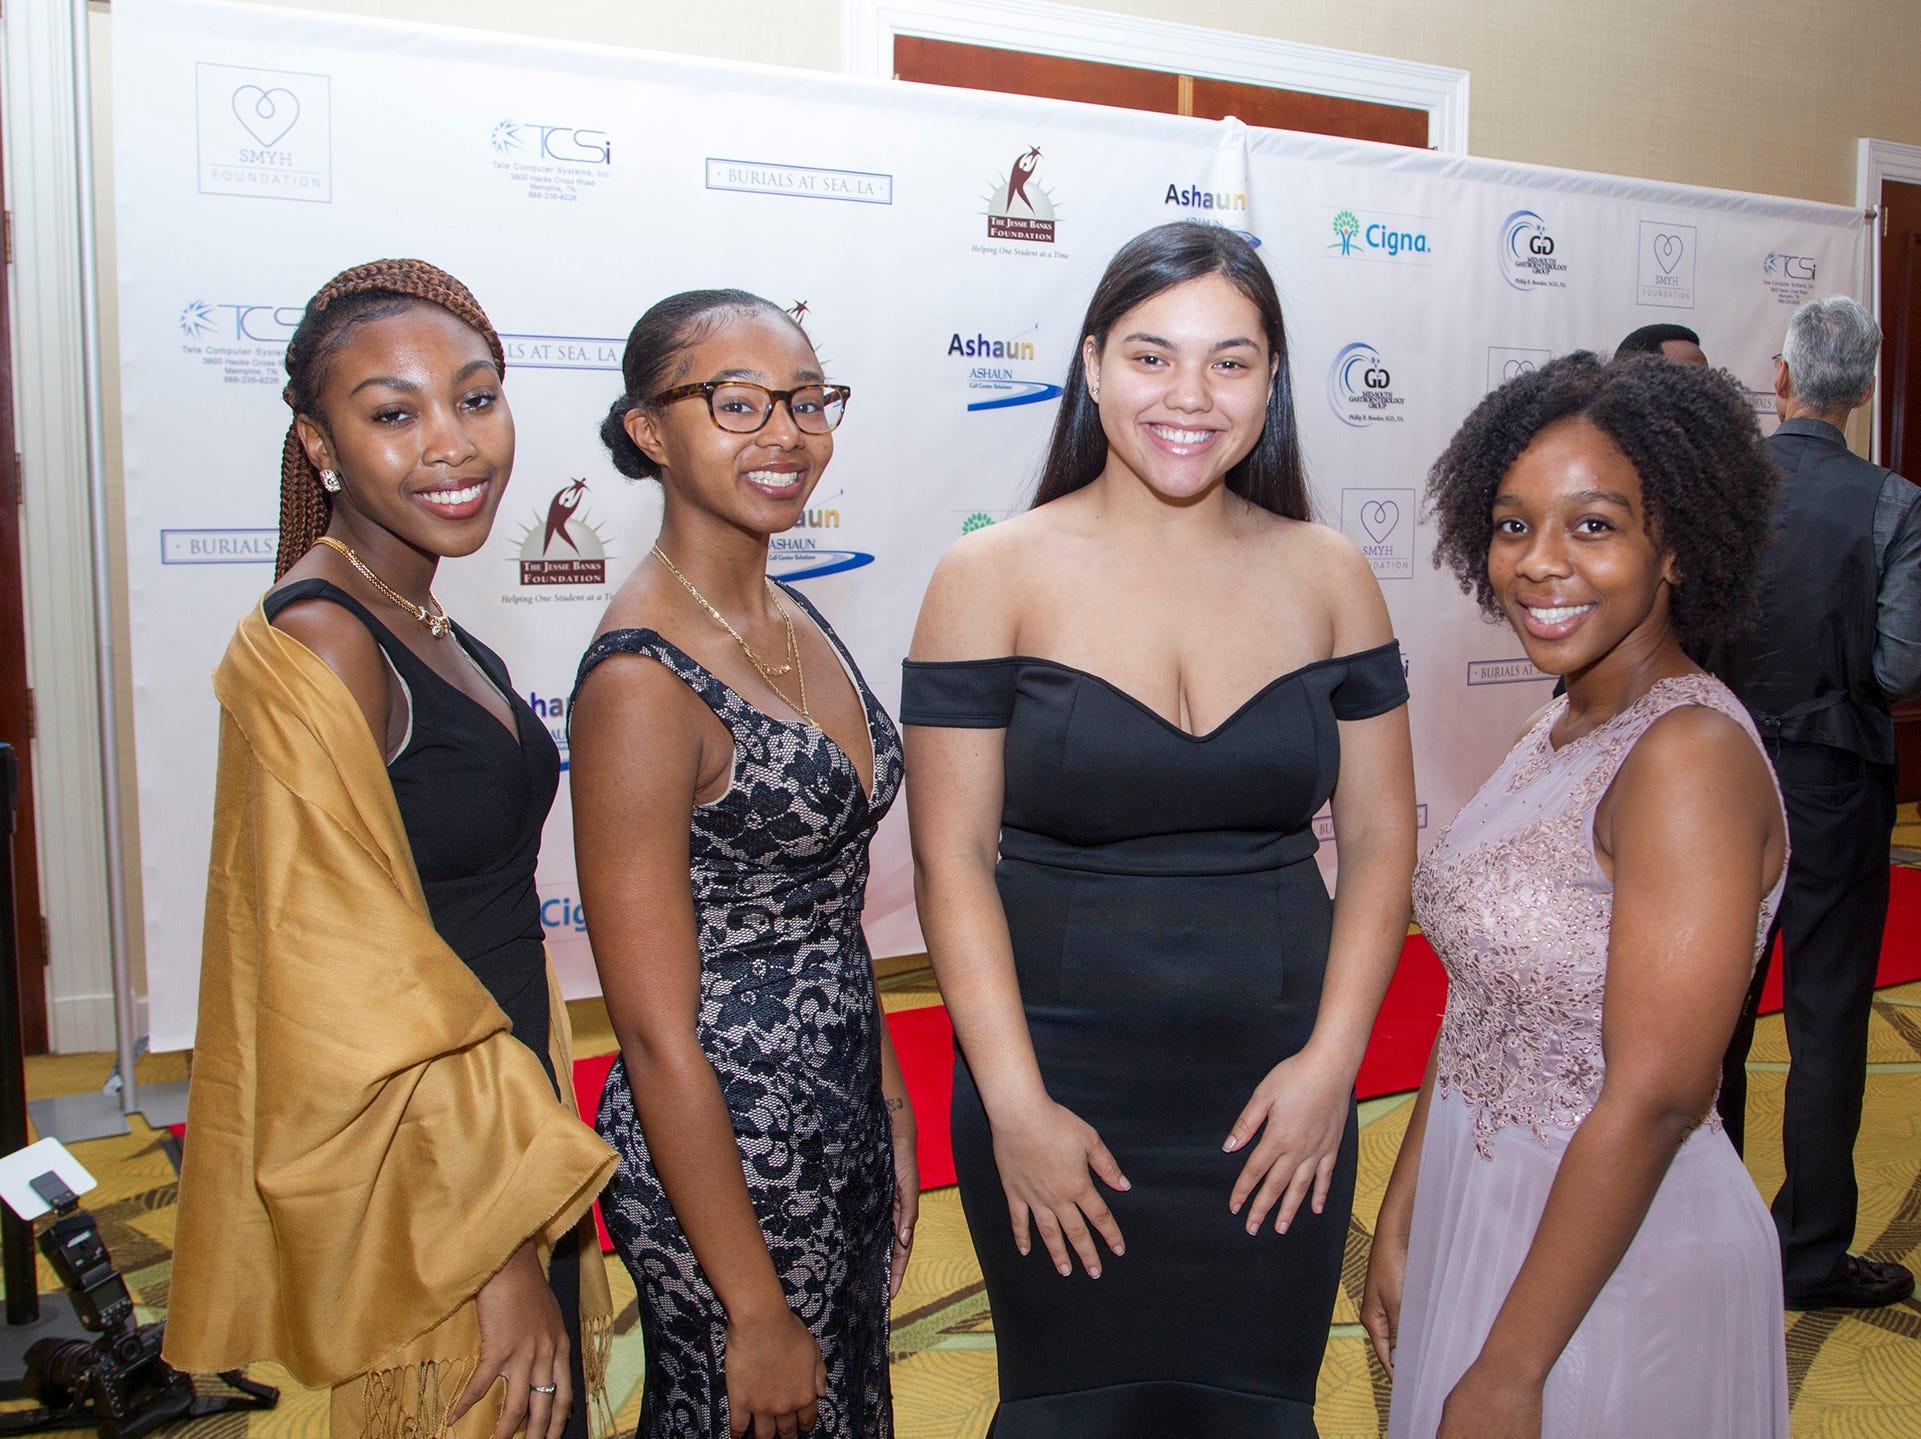 Daijia Canton, Amoria Burks, Jerena Veras, Kristen Dillard. Jessie Banks Foundation holds 16th annual Scholarship Awards Gala in Teaneck. 11/09/2018